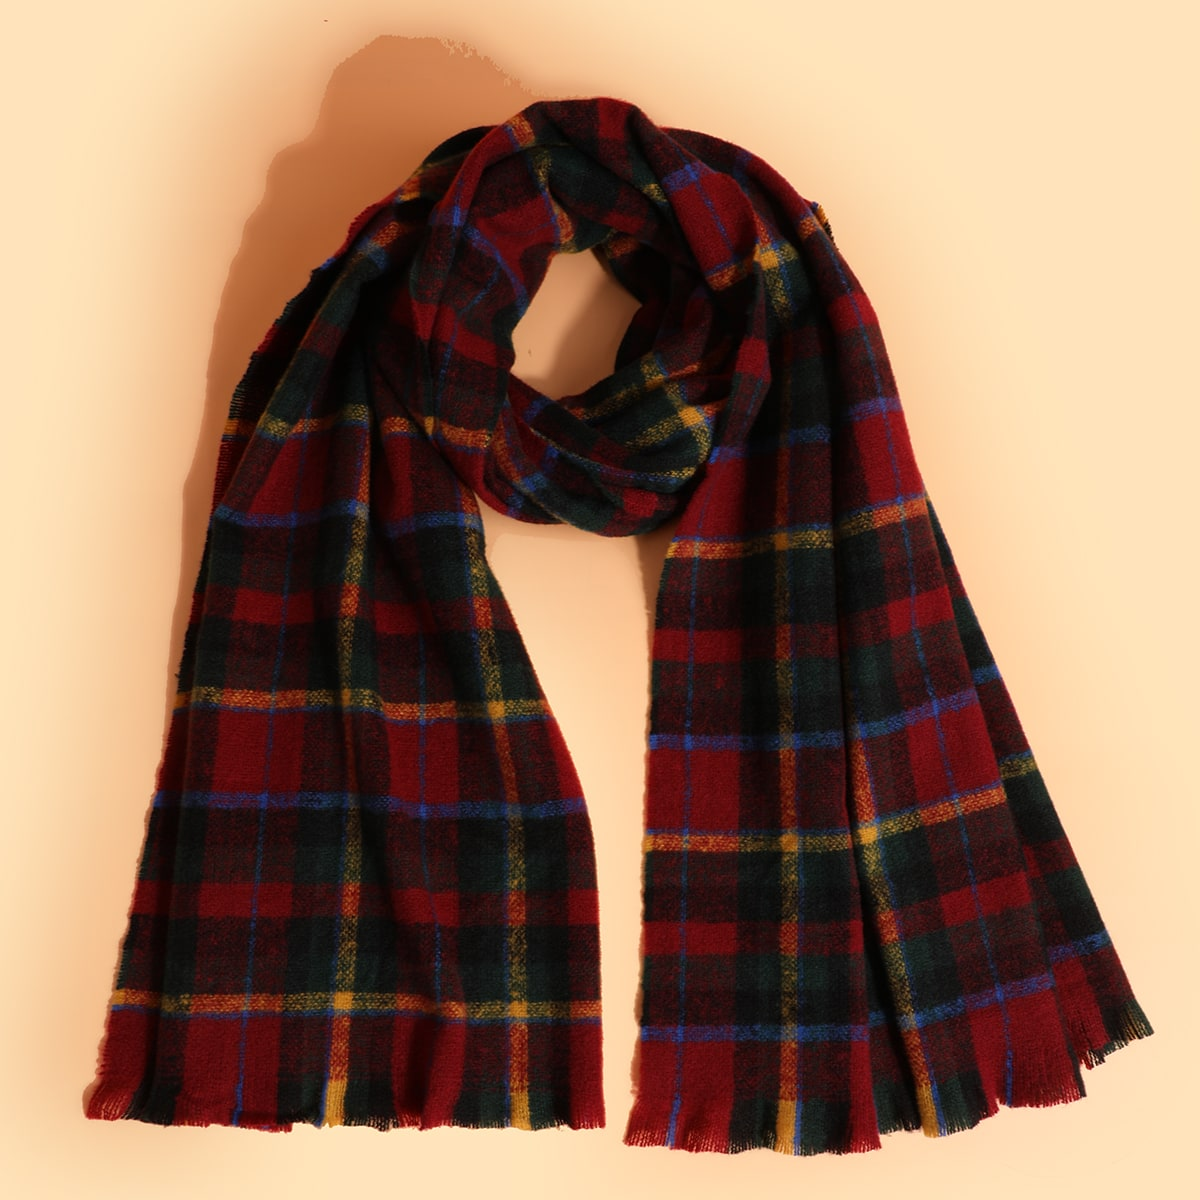 shein Mannen geruite patroon sjaal